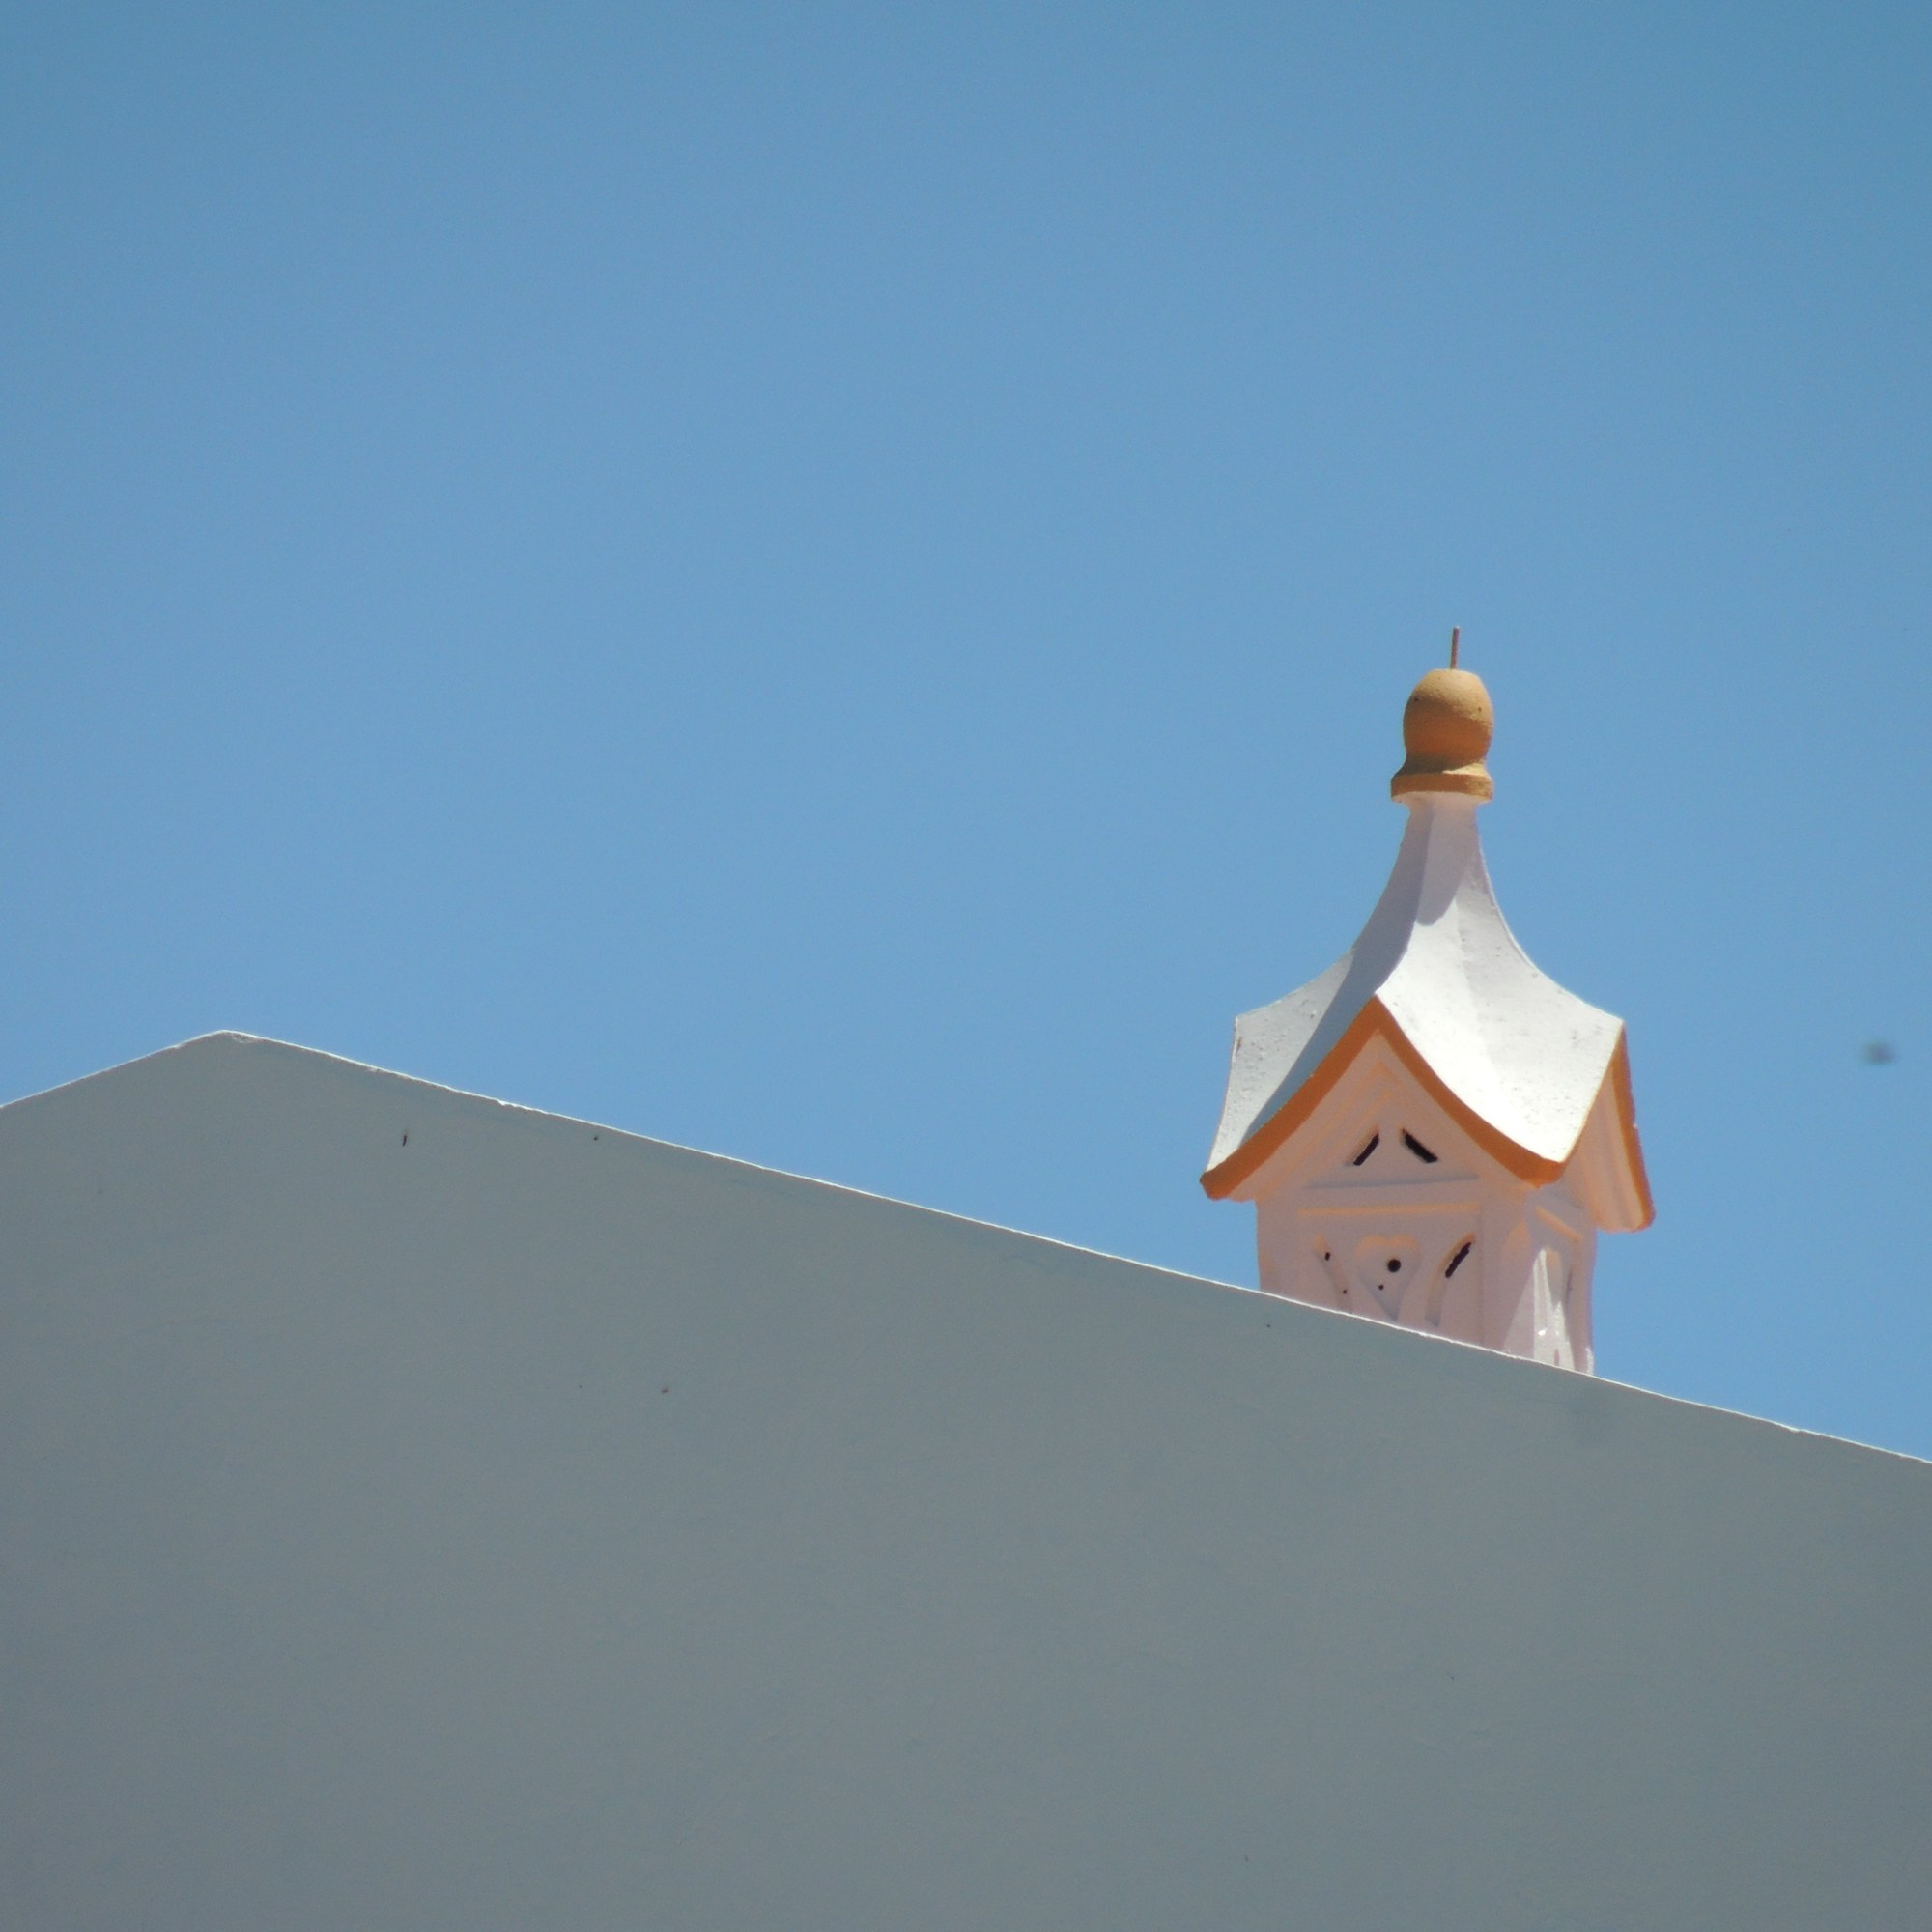 Spy a chimney